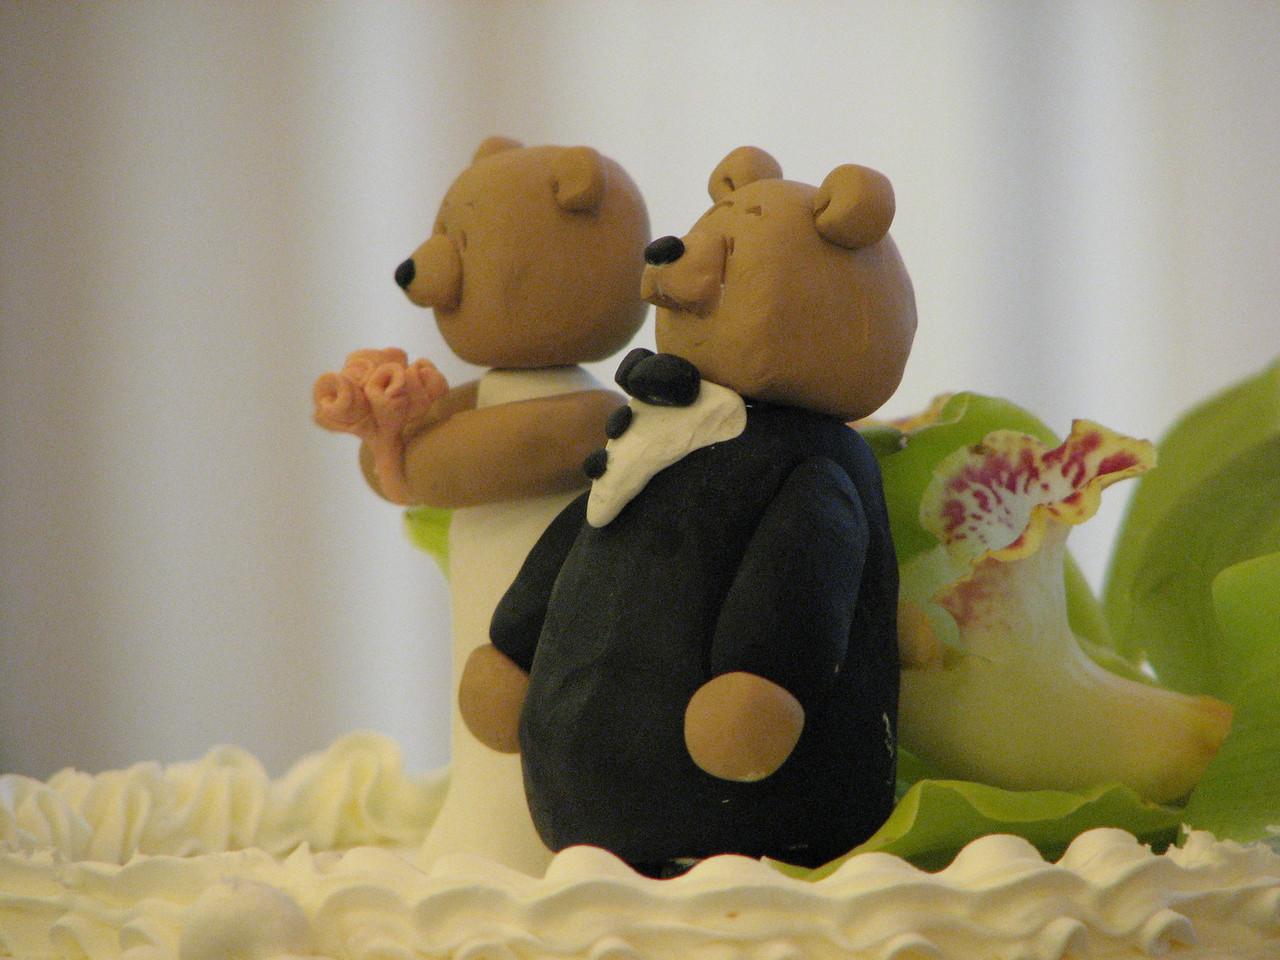 2007 06 09 Sat - Wedding cake topper 2